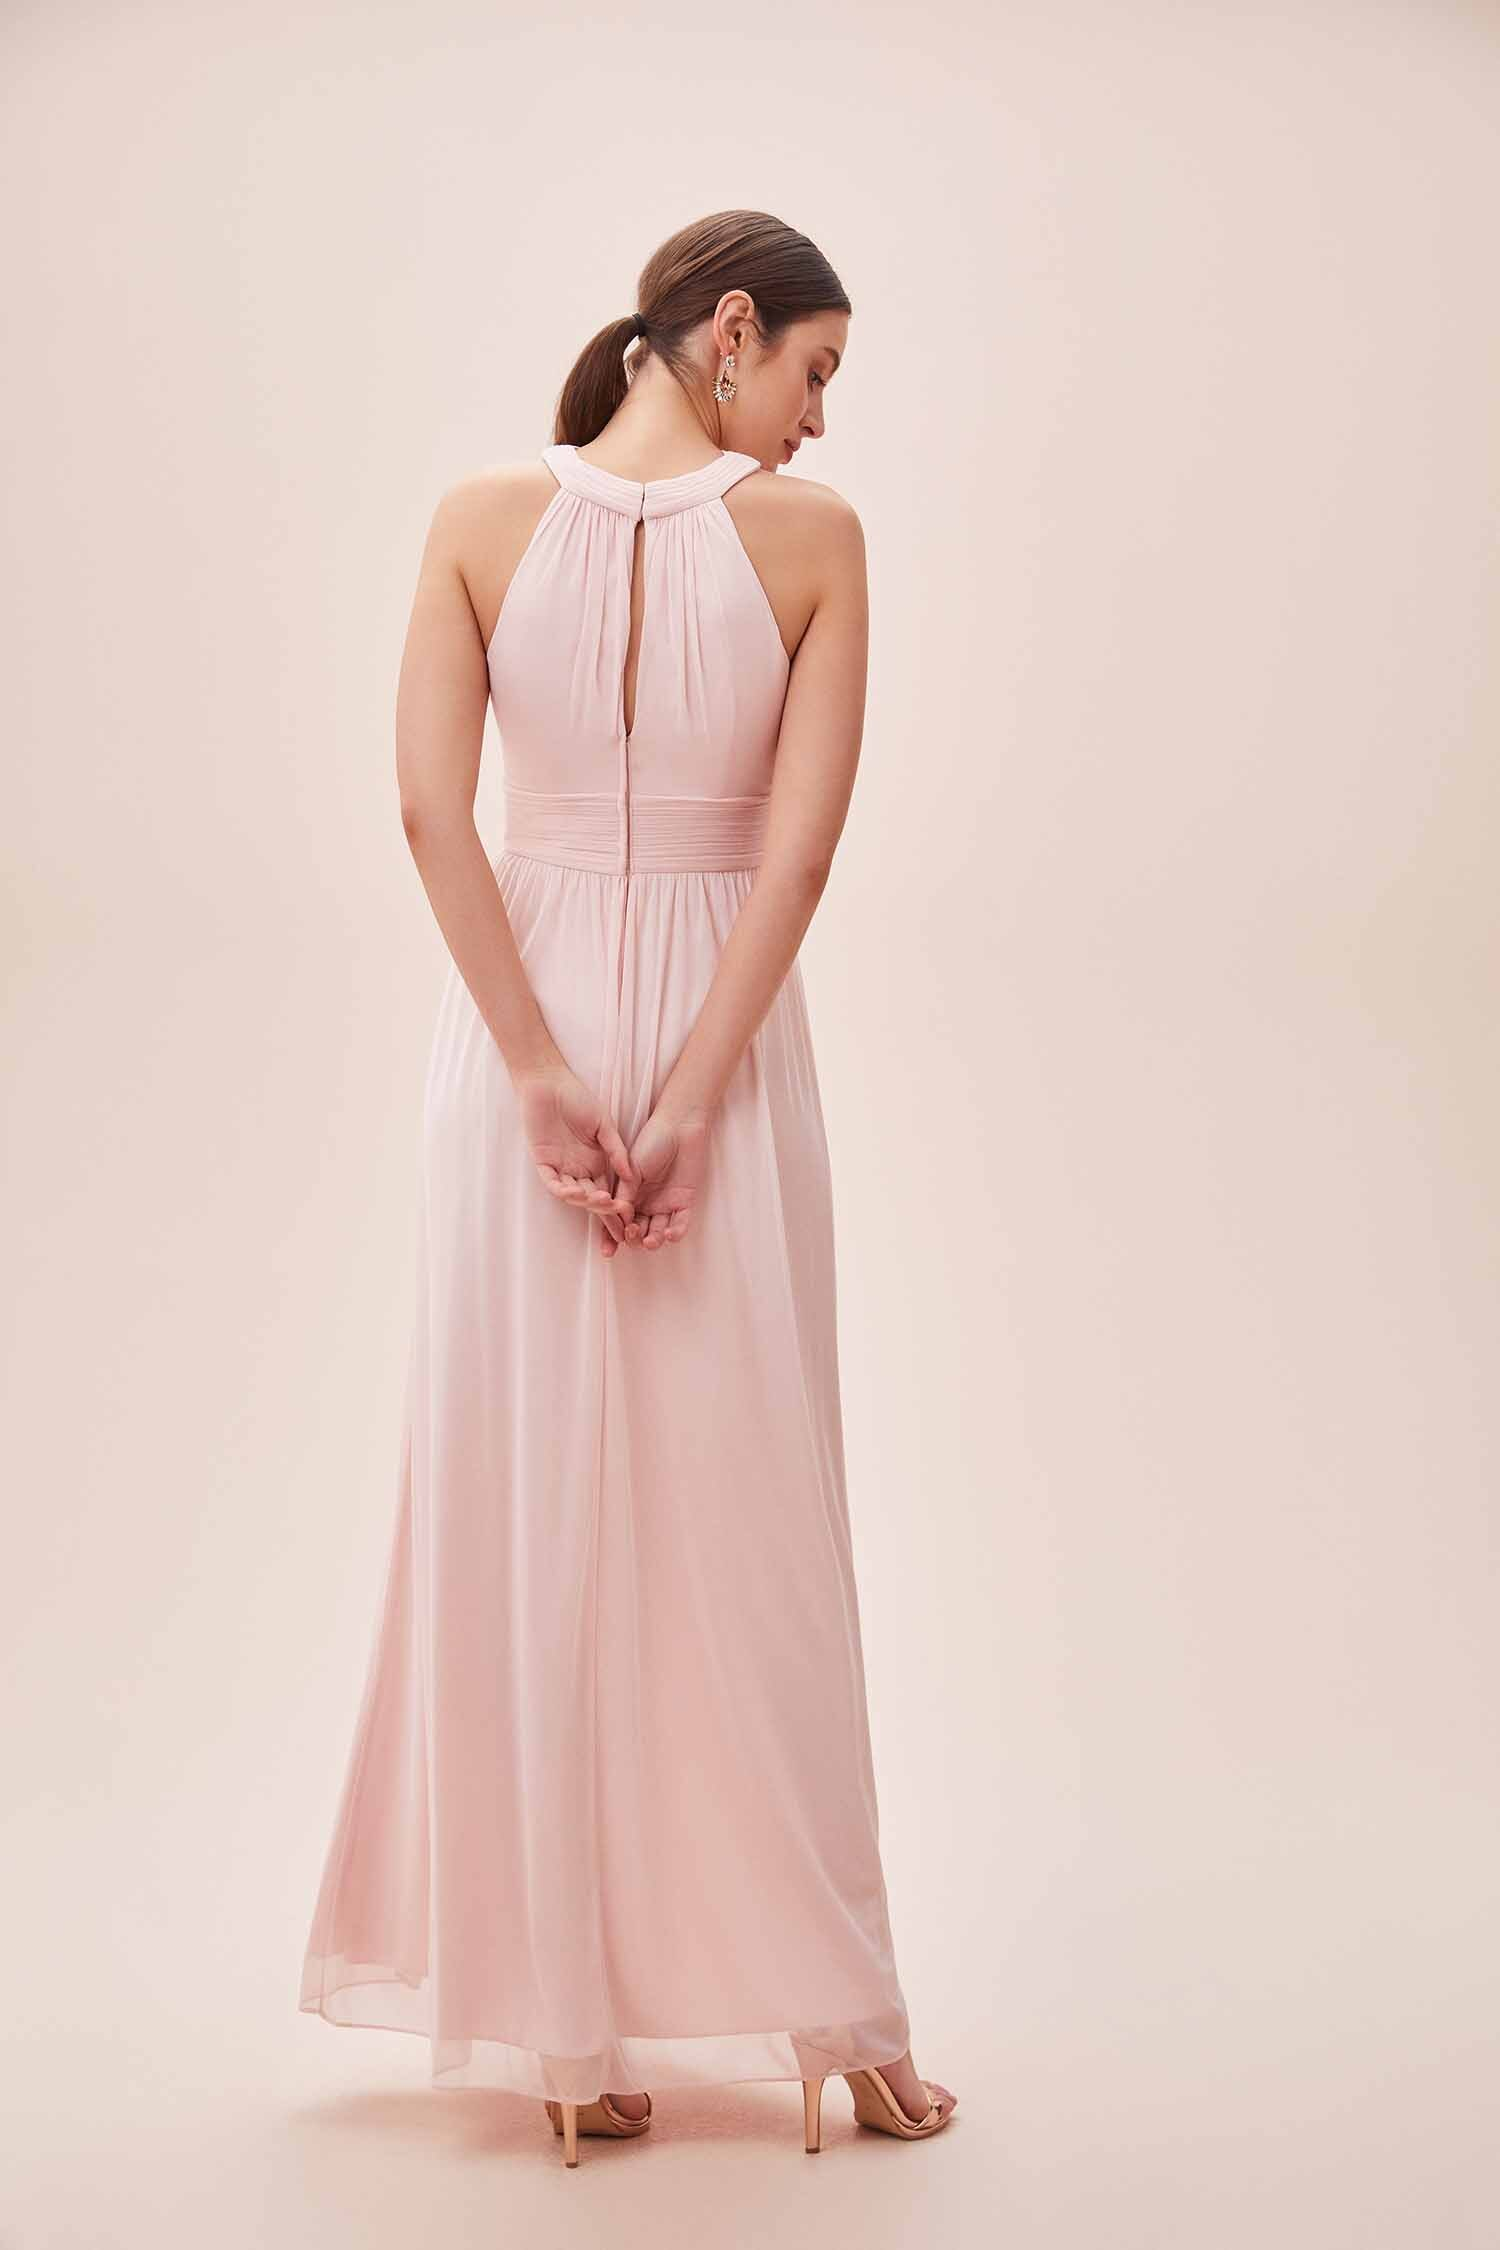 Toz Pembe Çapraz Halter Yaka Yırtmaçlı Elbise - Thumbnail